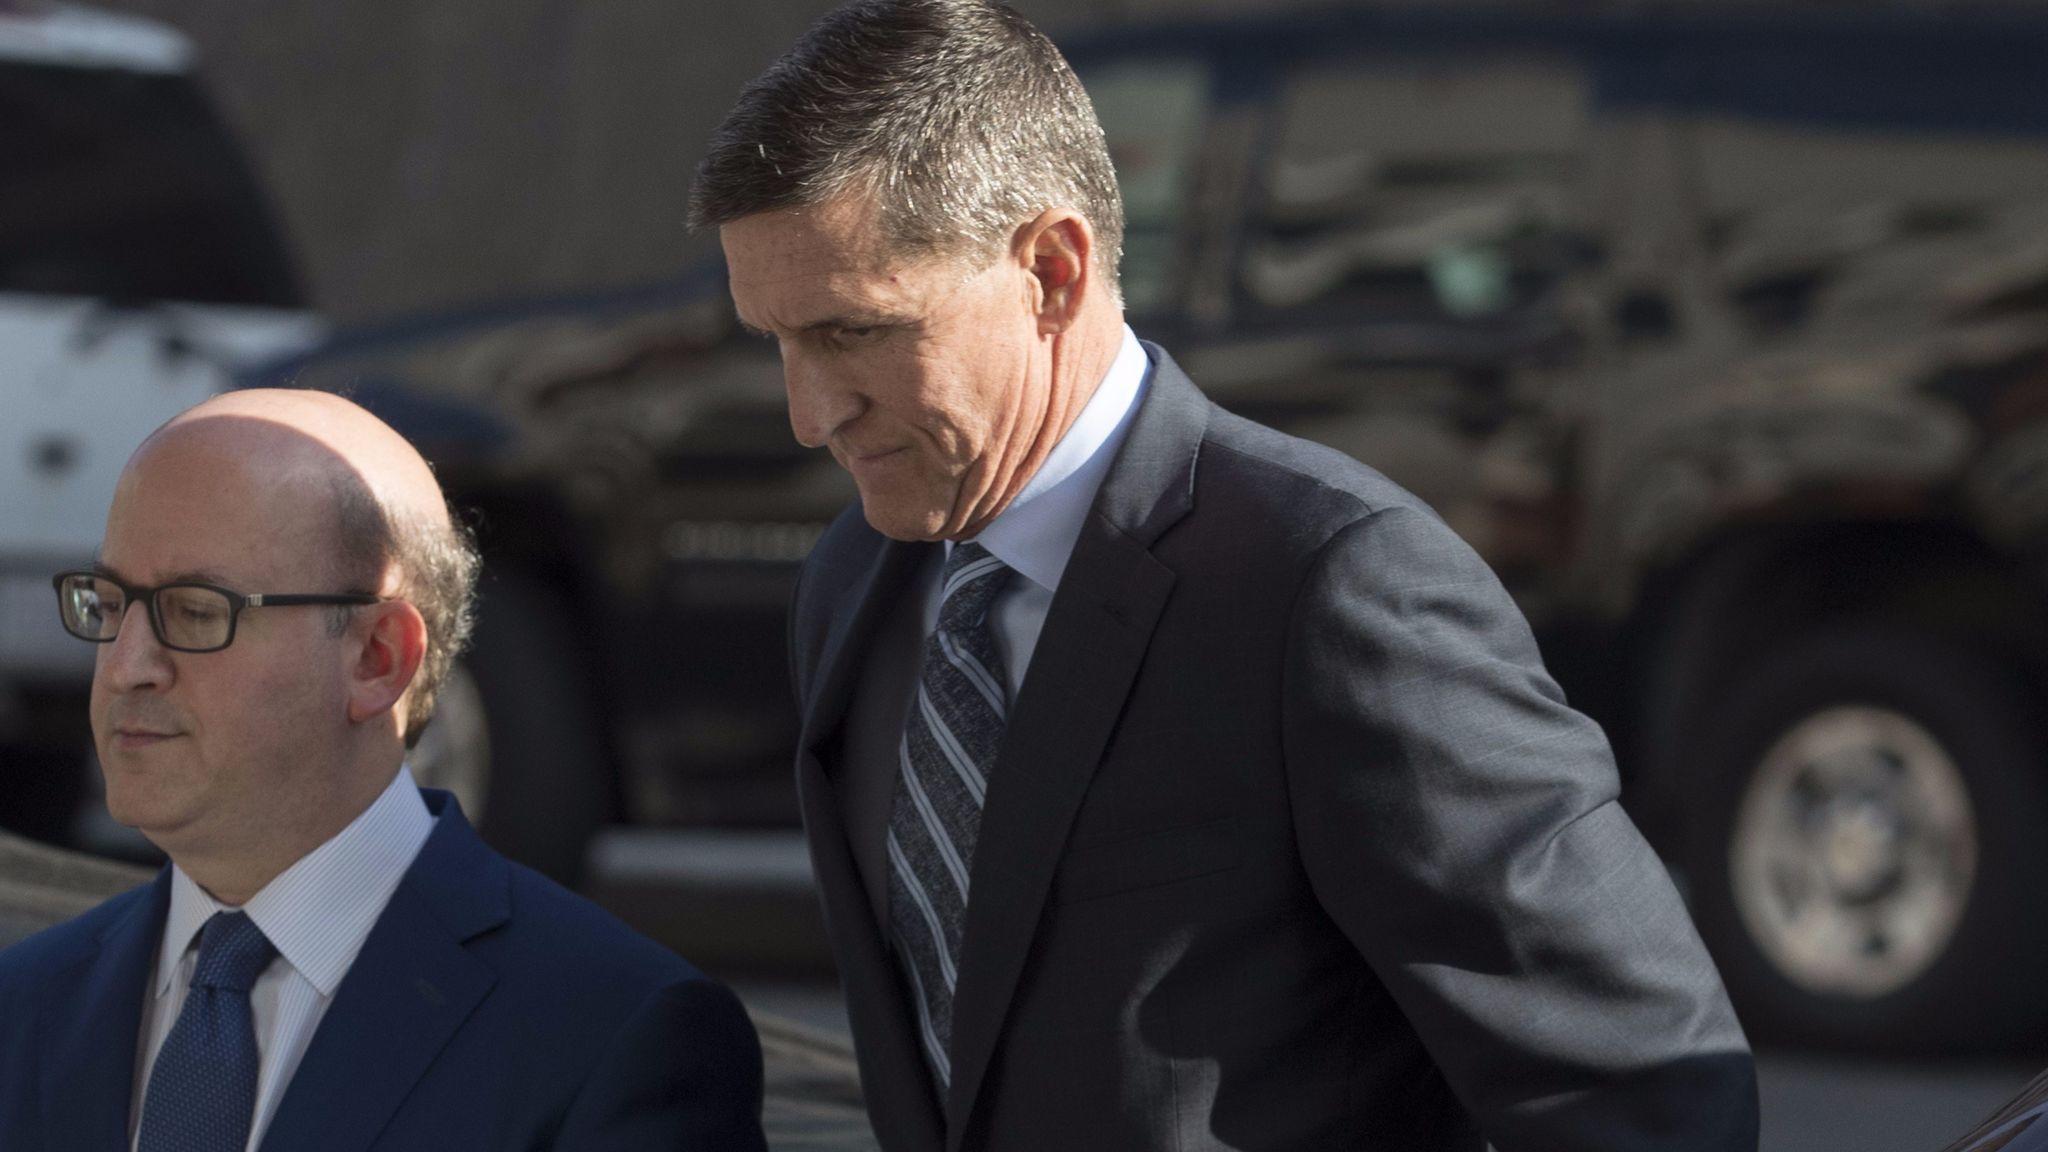 Former National Security Advisor Michael Flynn, Washington, USA - 01 Dec 2017